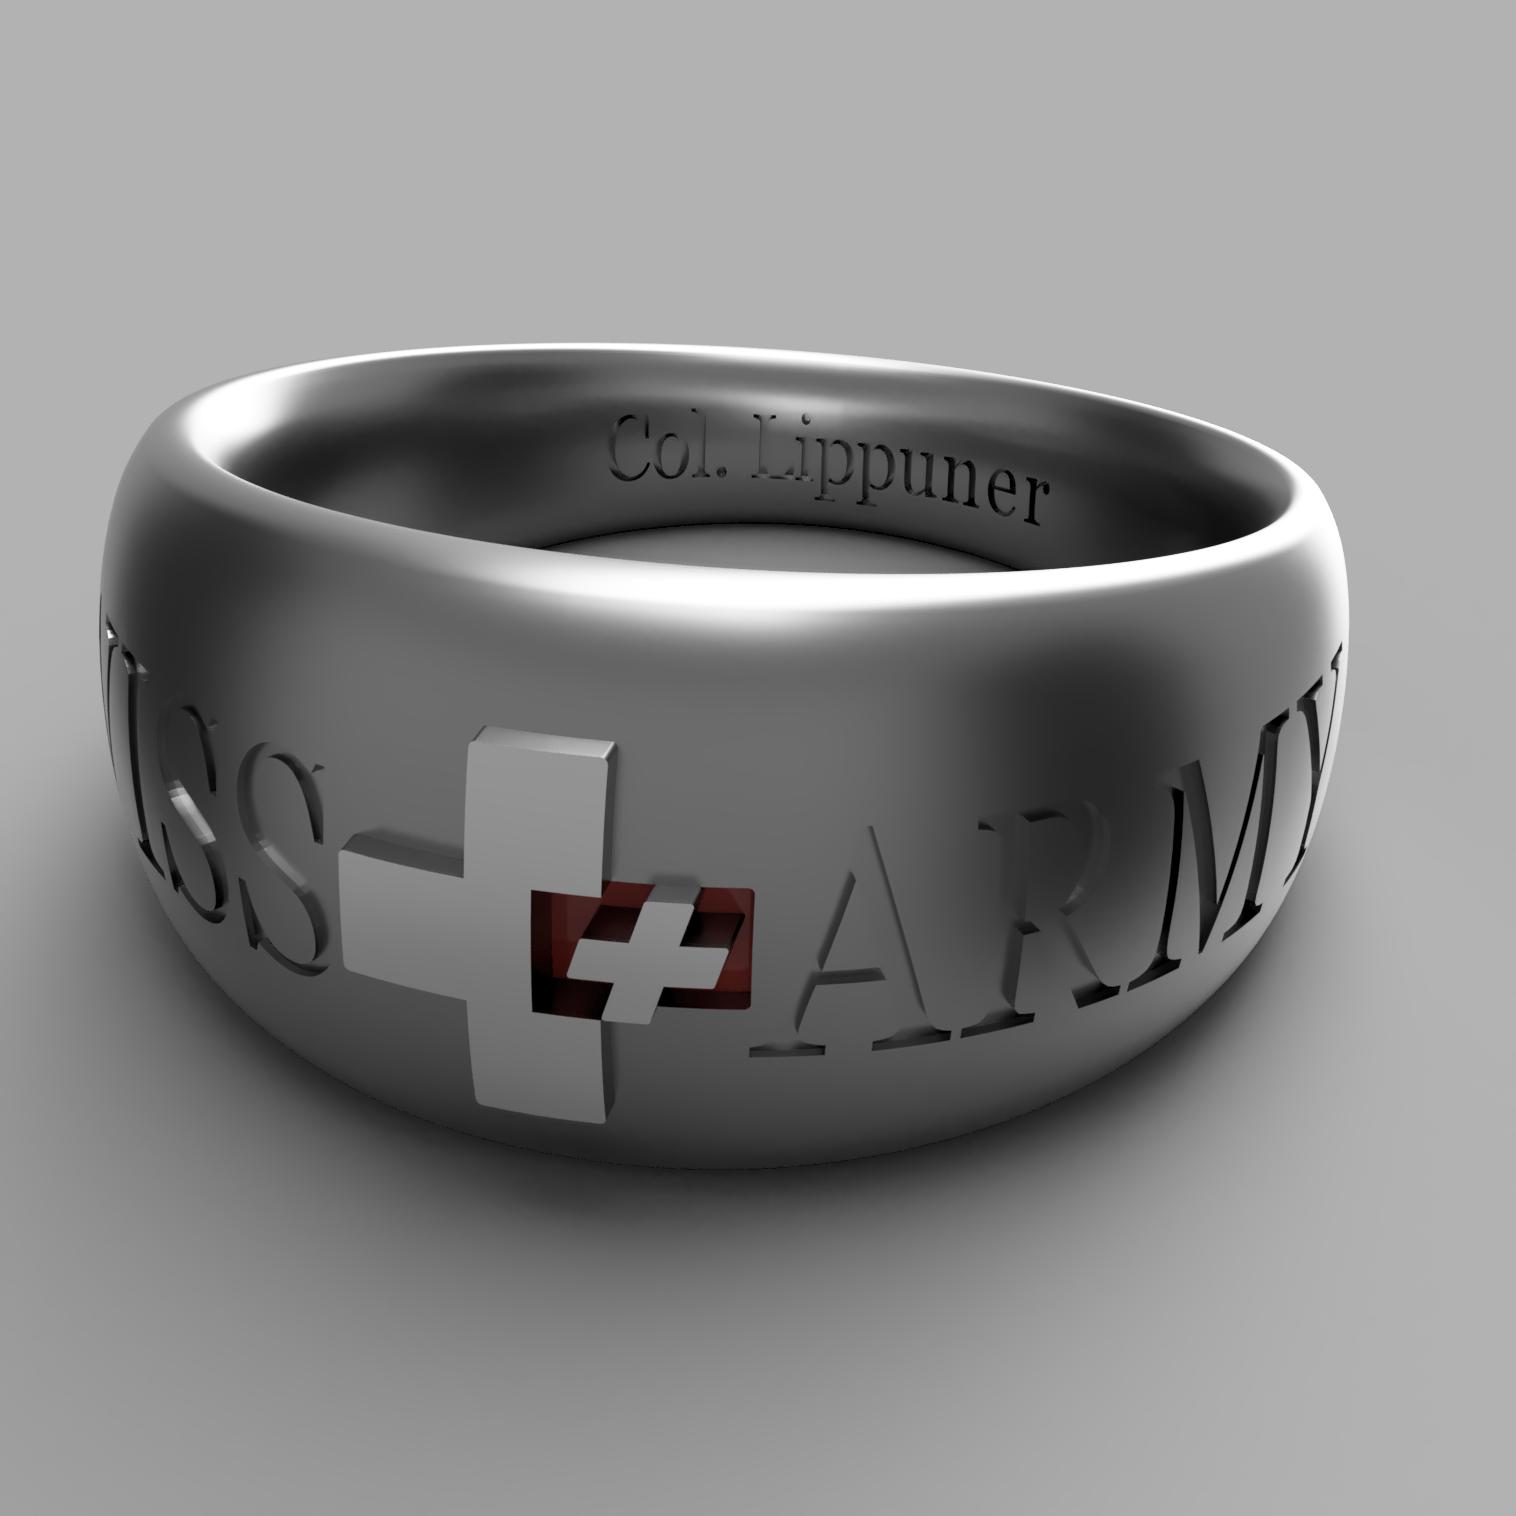 Swiss_Army2.png Download free STL file Swiss Army • 3D printable object, albertkarlen